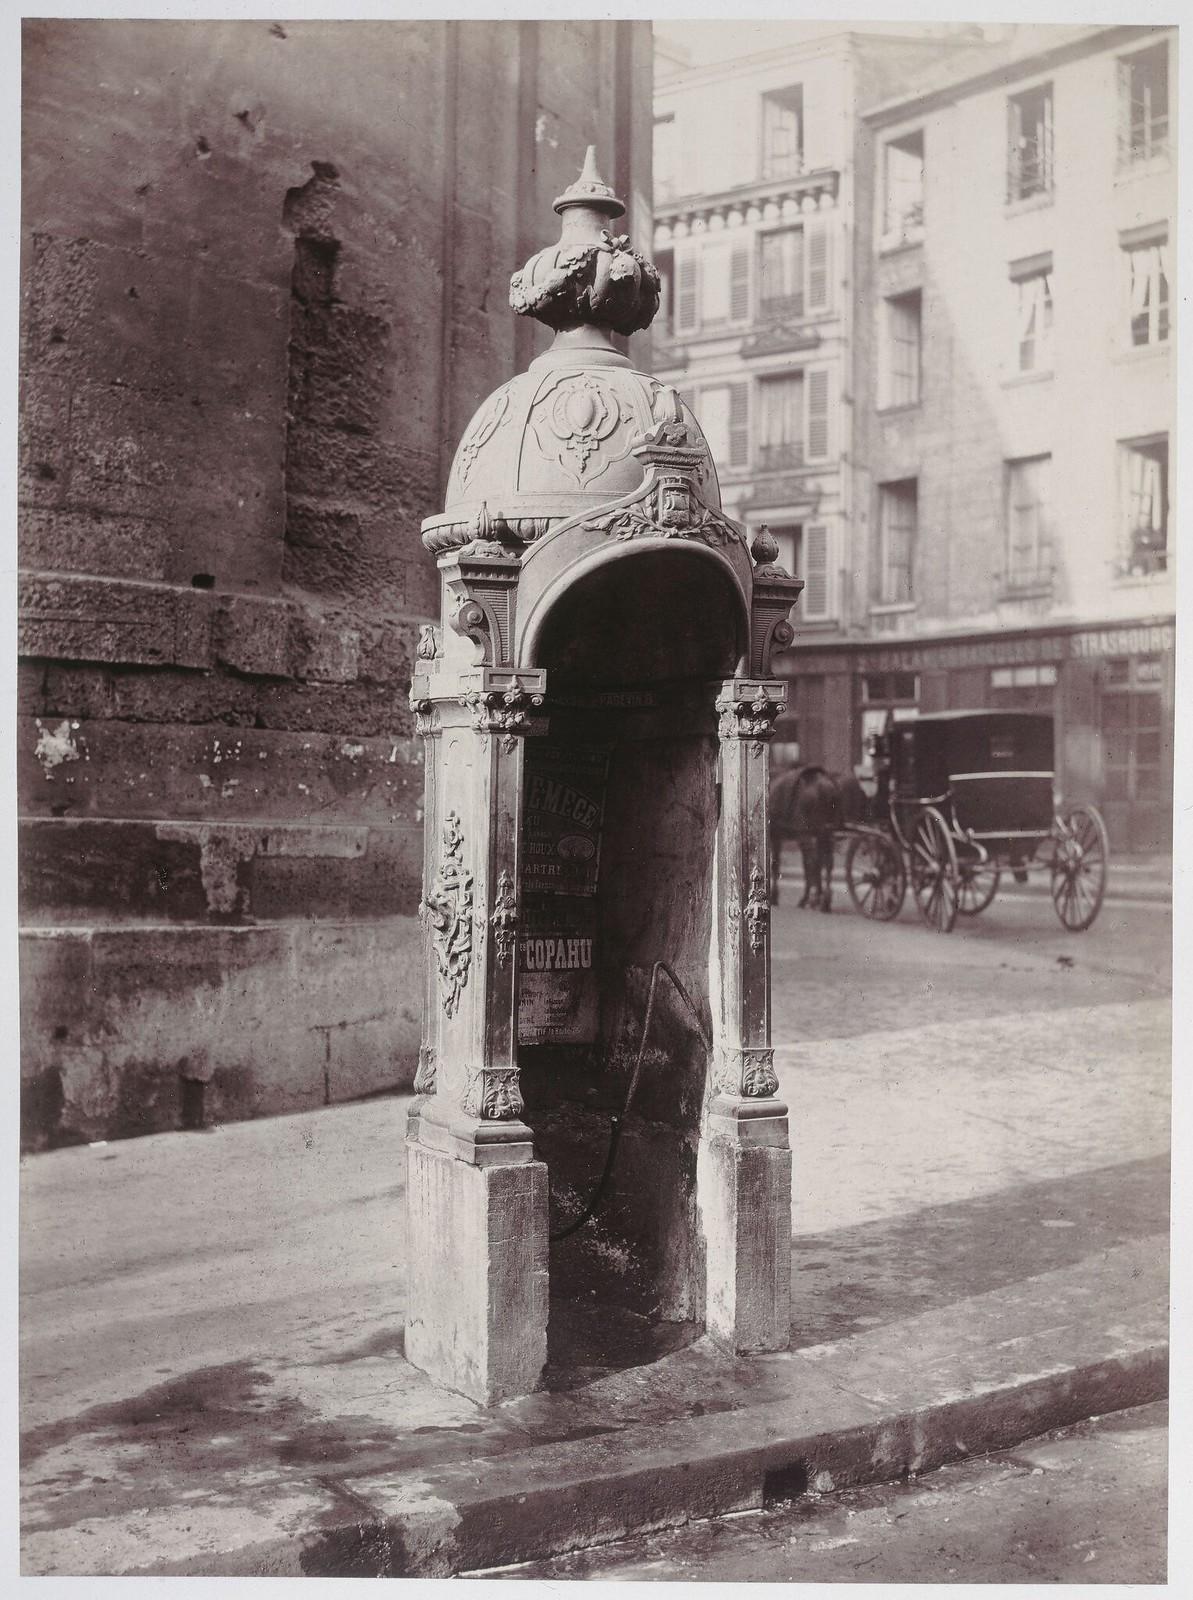 1870. Писсуар, улица дю Фобур Сен-Мартен. Париж (X округ)